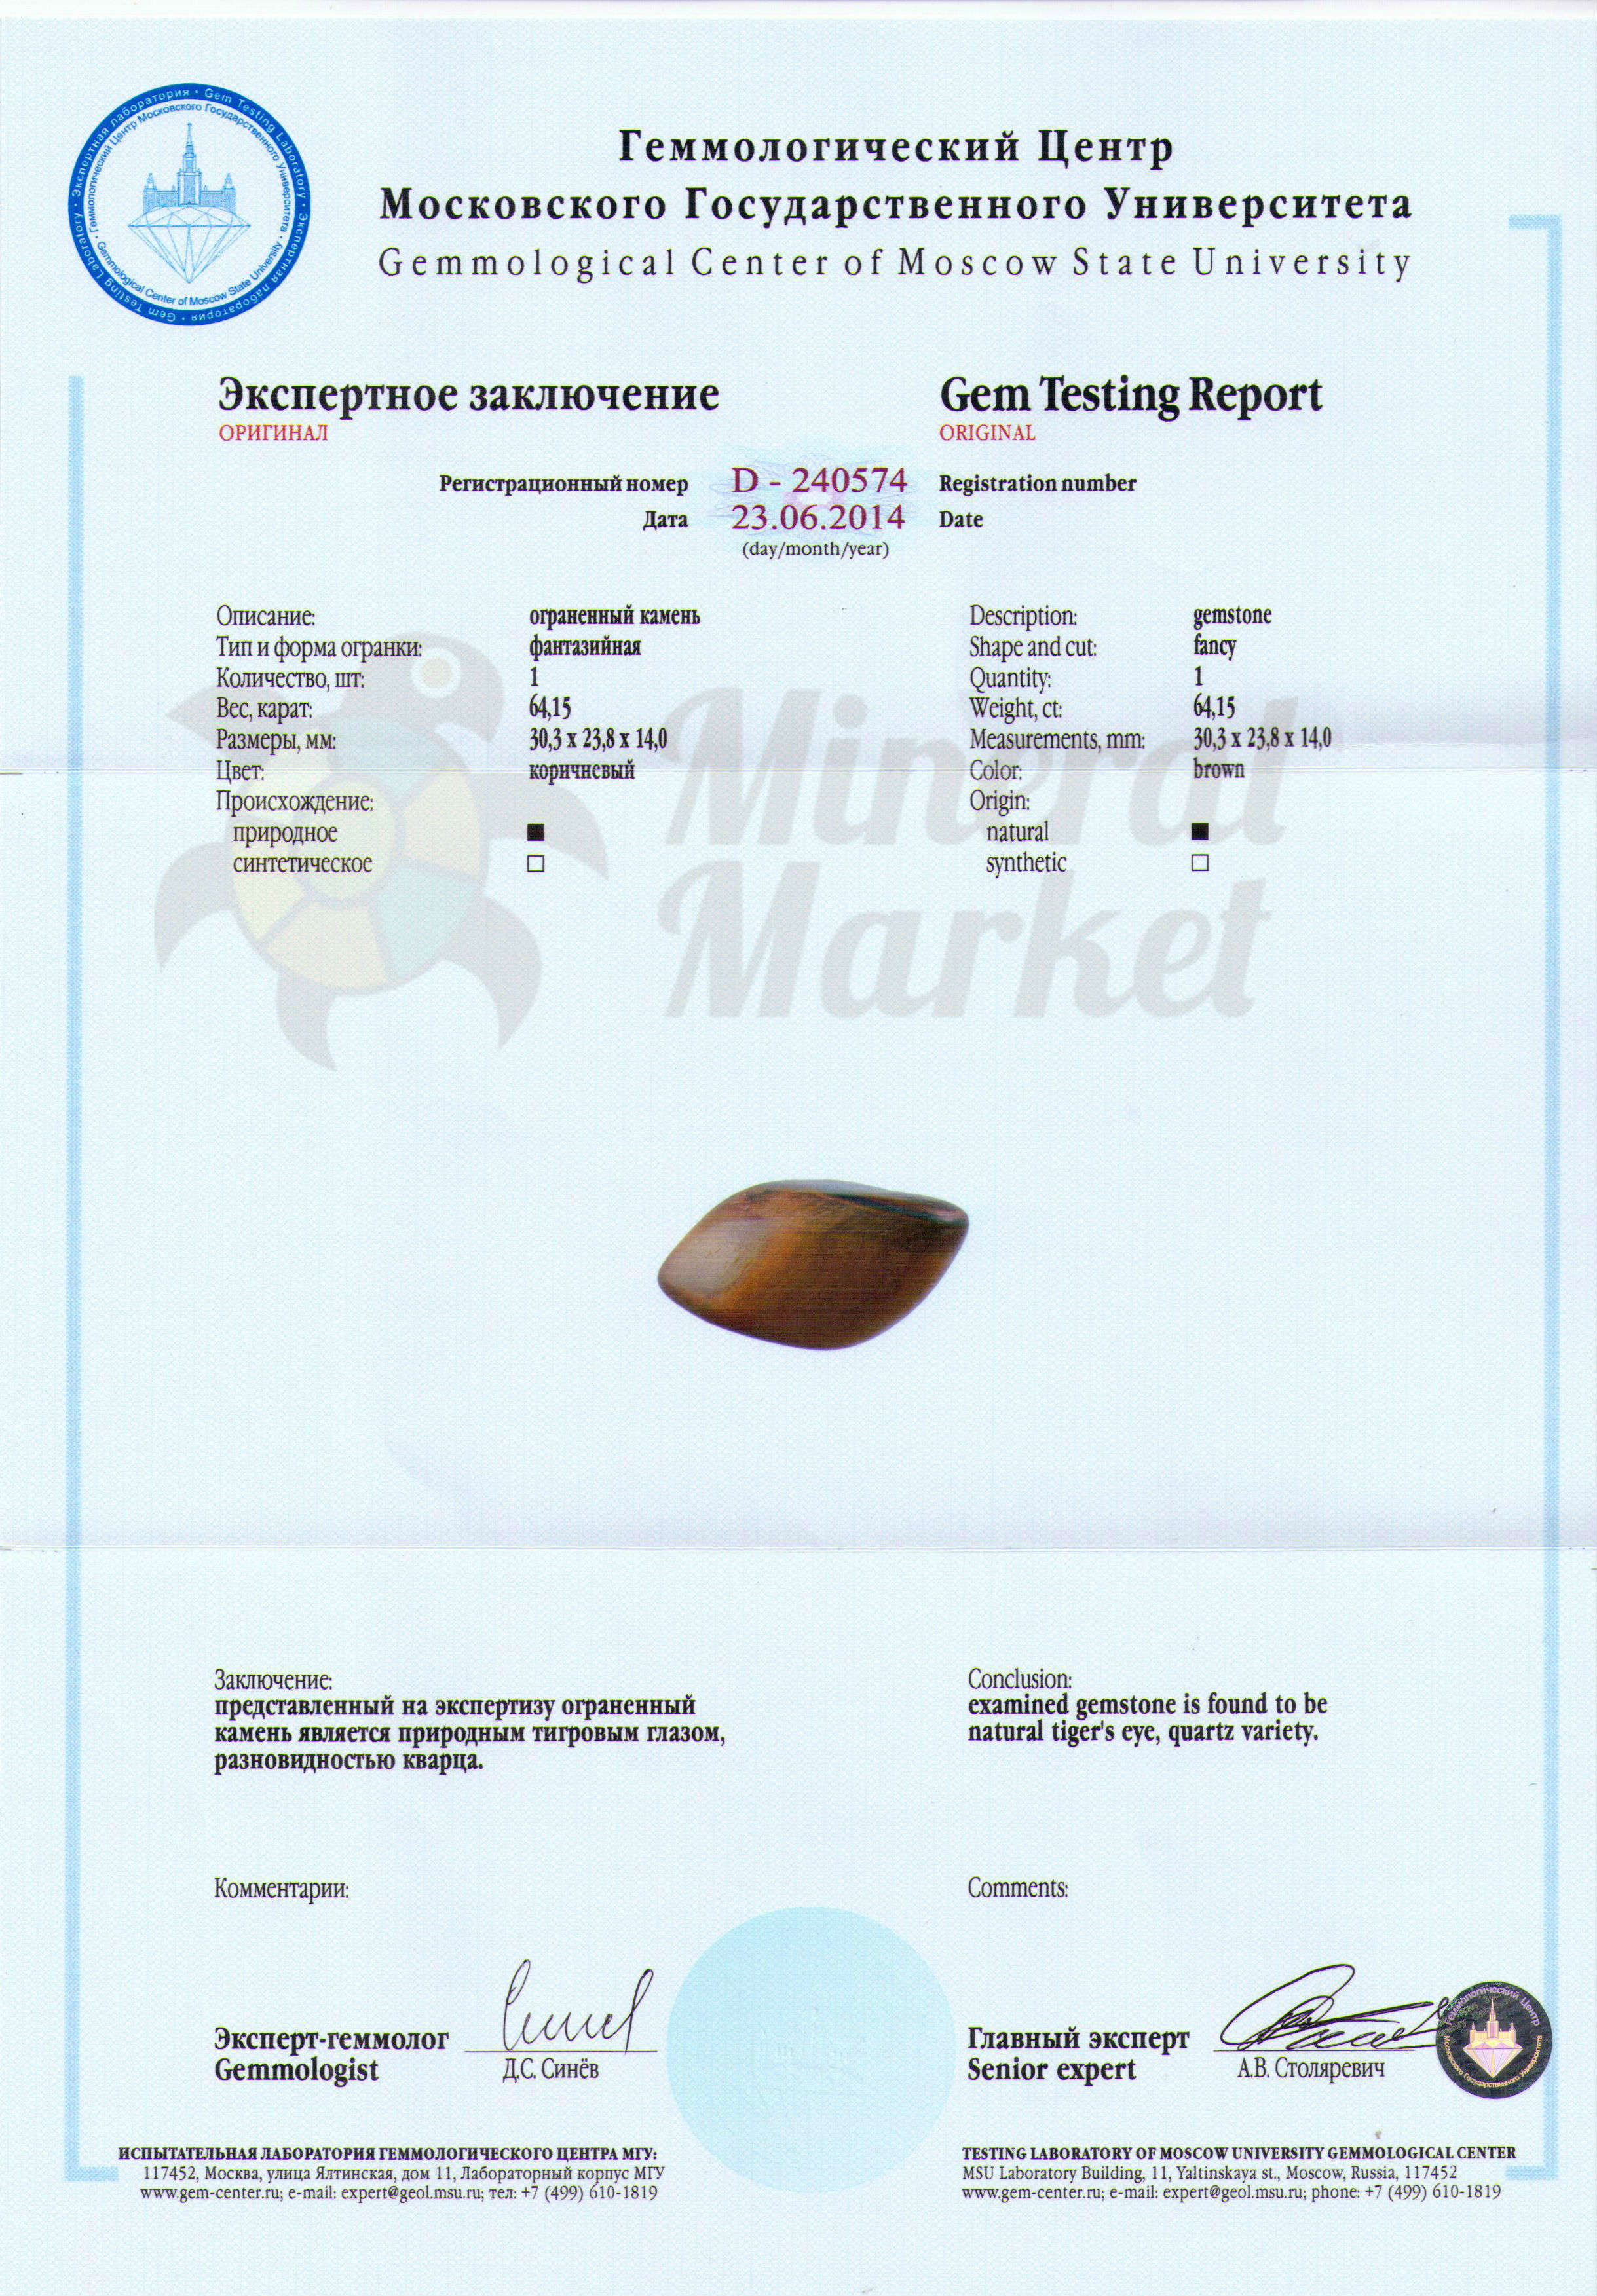 http://mineralmarket.ru/img/certificate/119.jpg